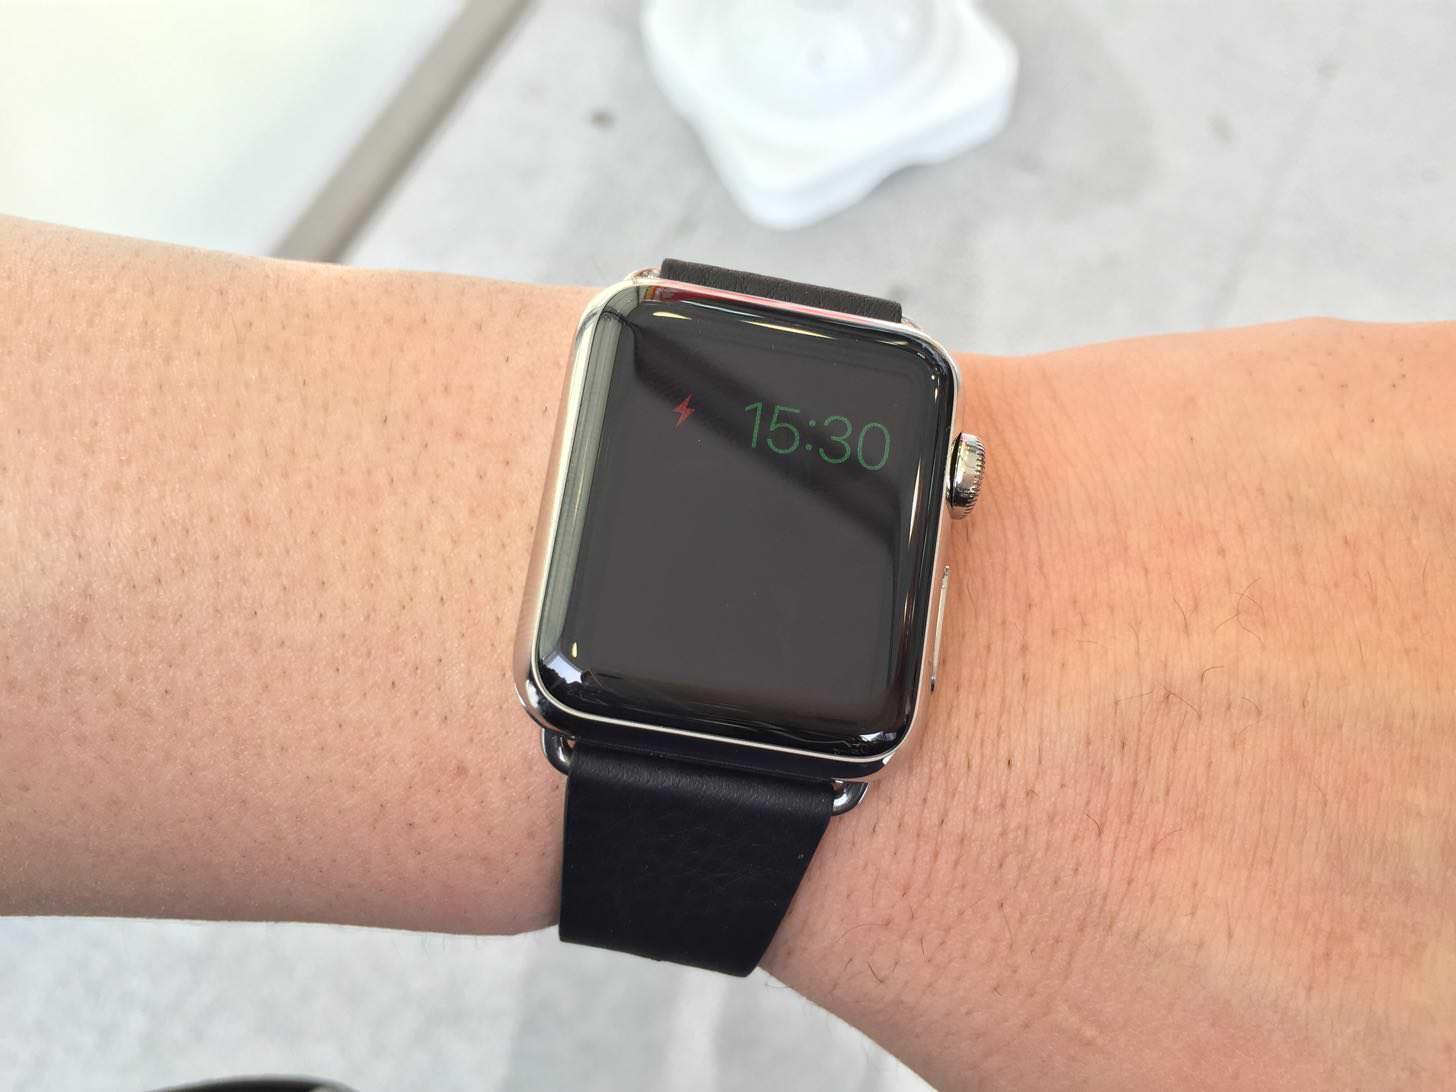 Apple Watchは、バッテリーが切れても「エンプティ画面」で時計が表示され続ける。